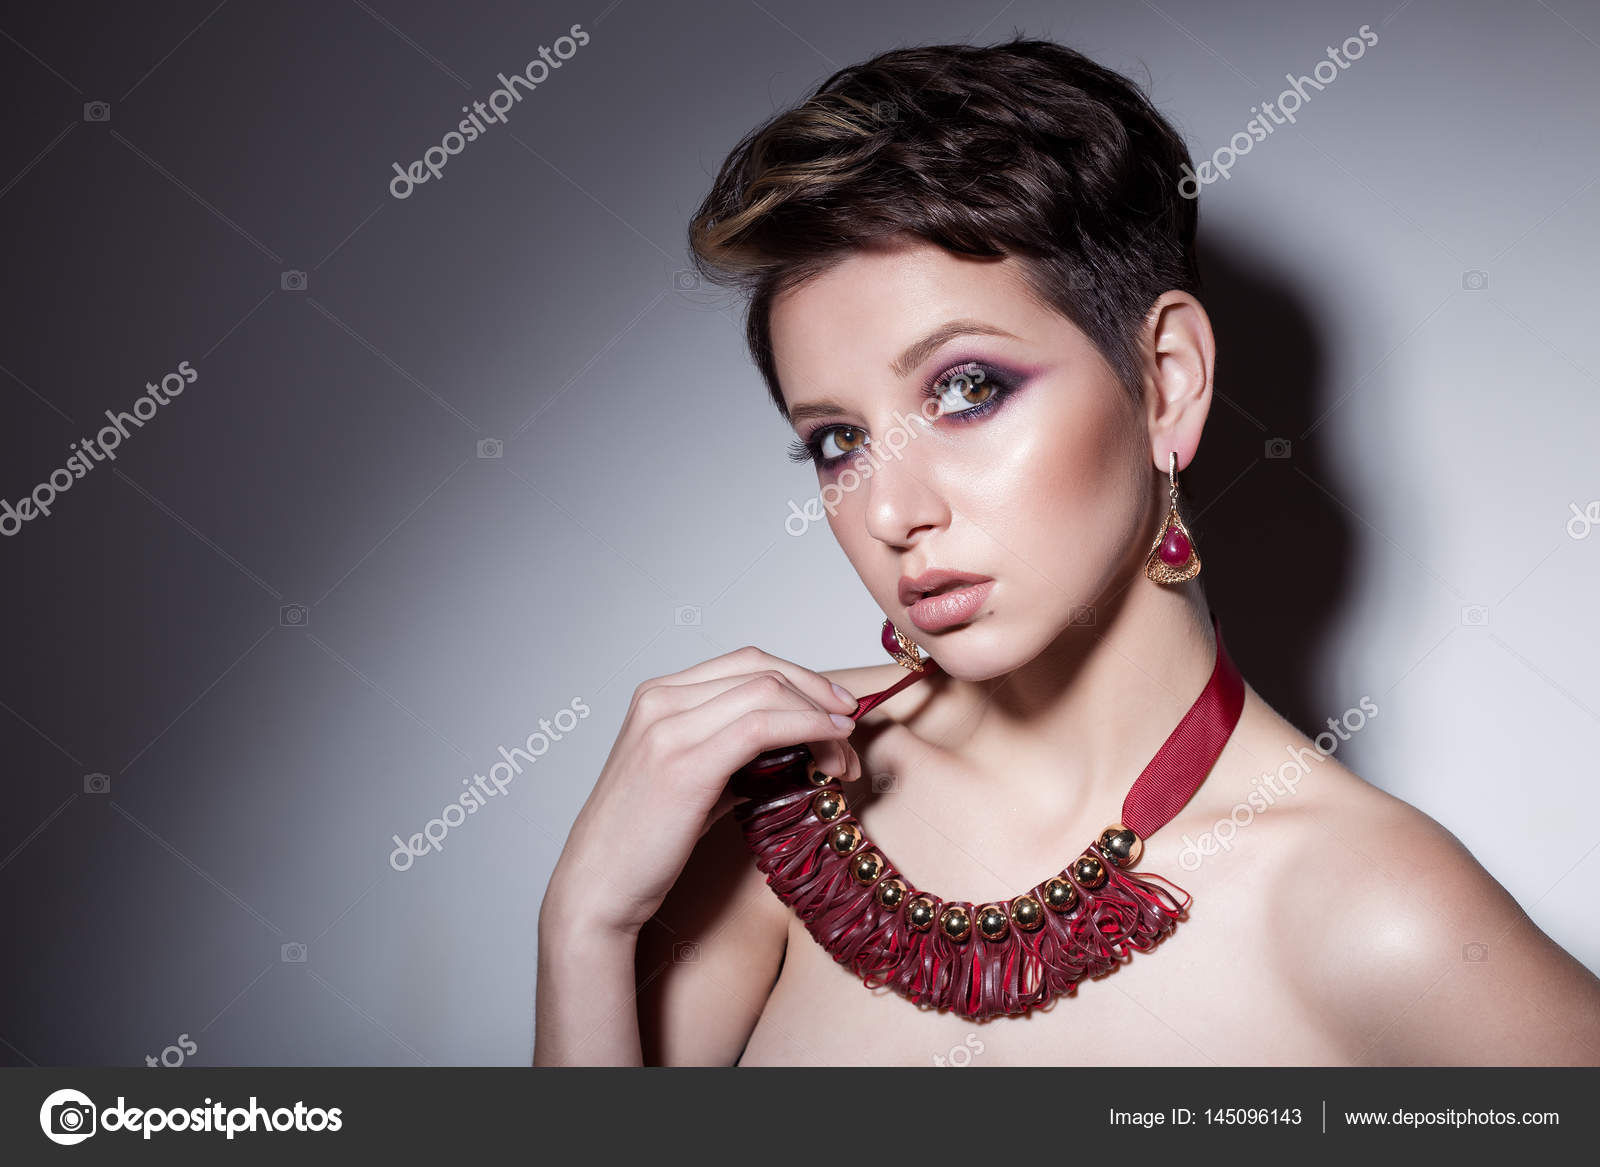 Girlsexphoto